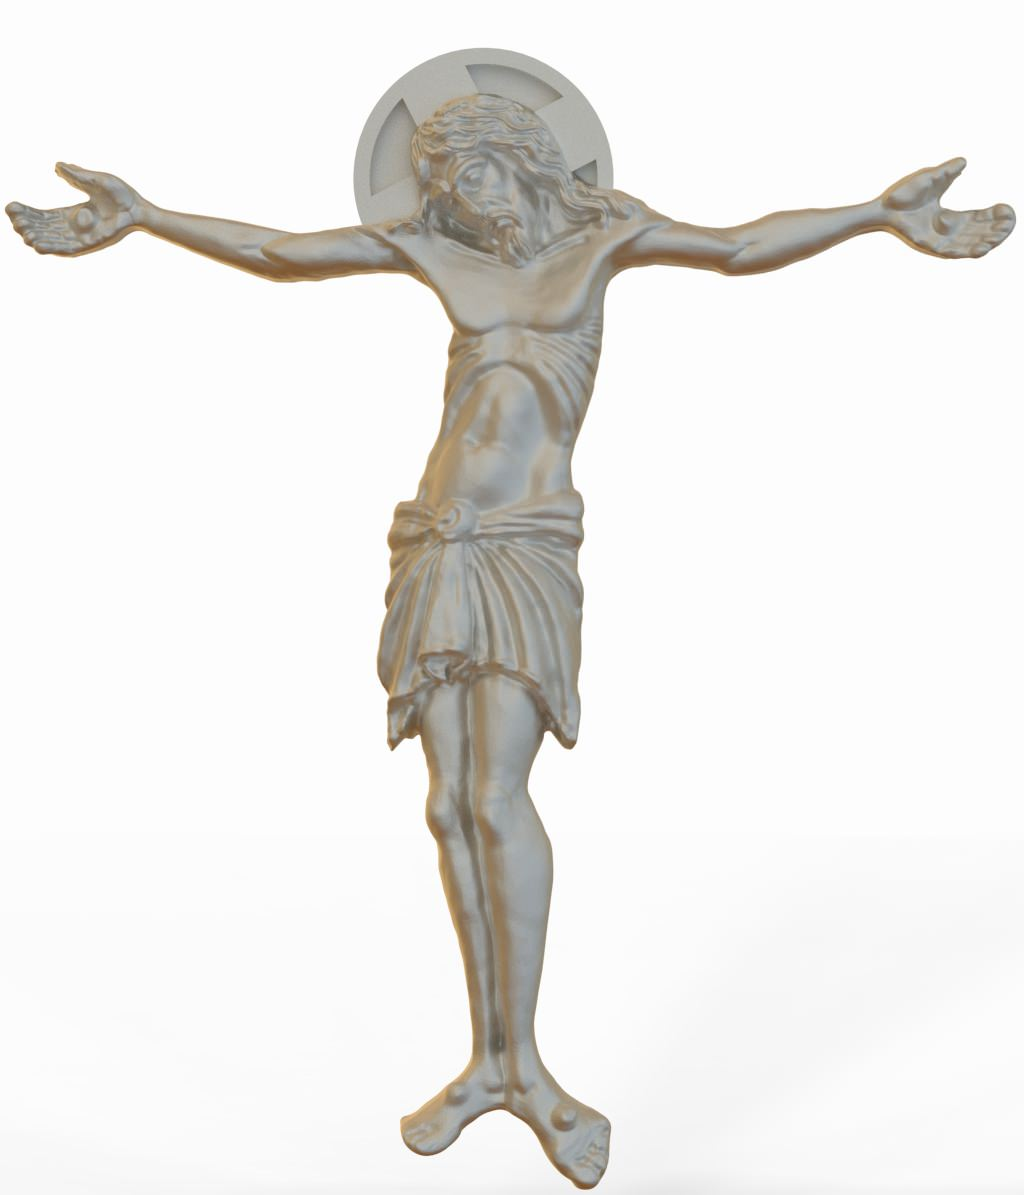 3D Model Jesus Christ STL 3D Model 3D Printable STL